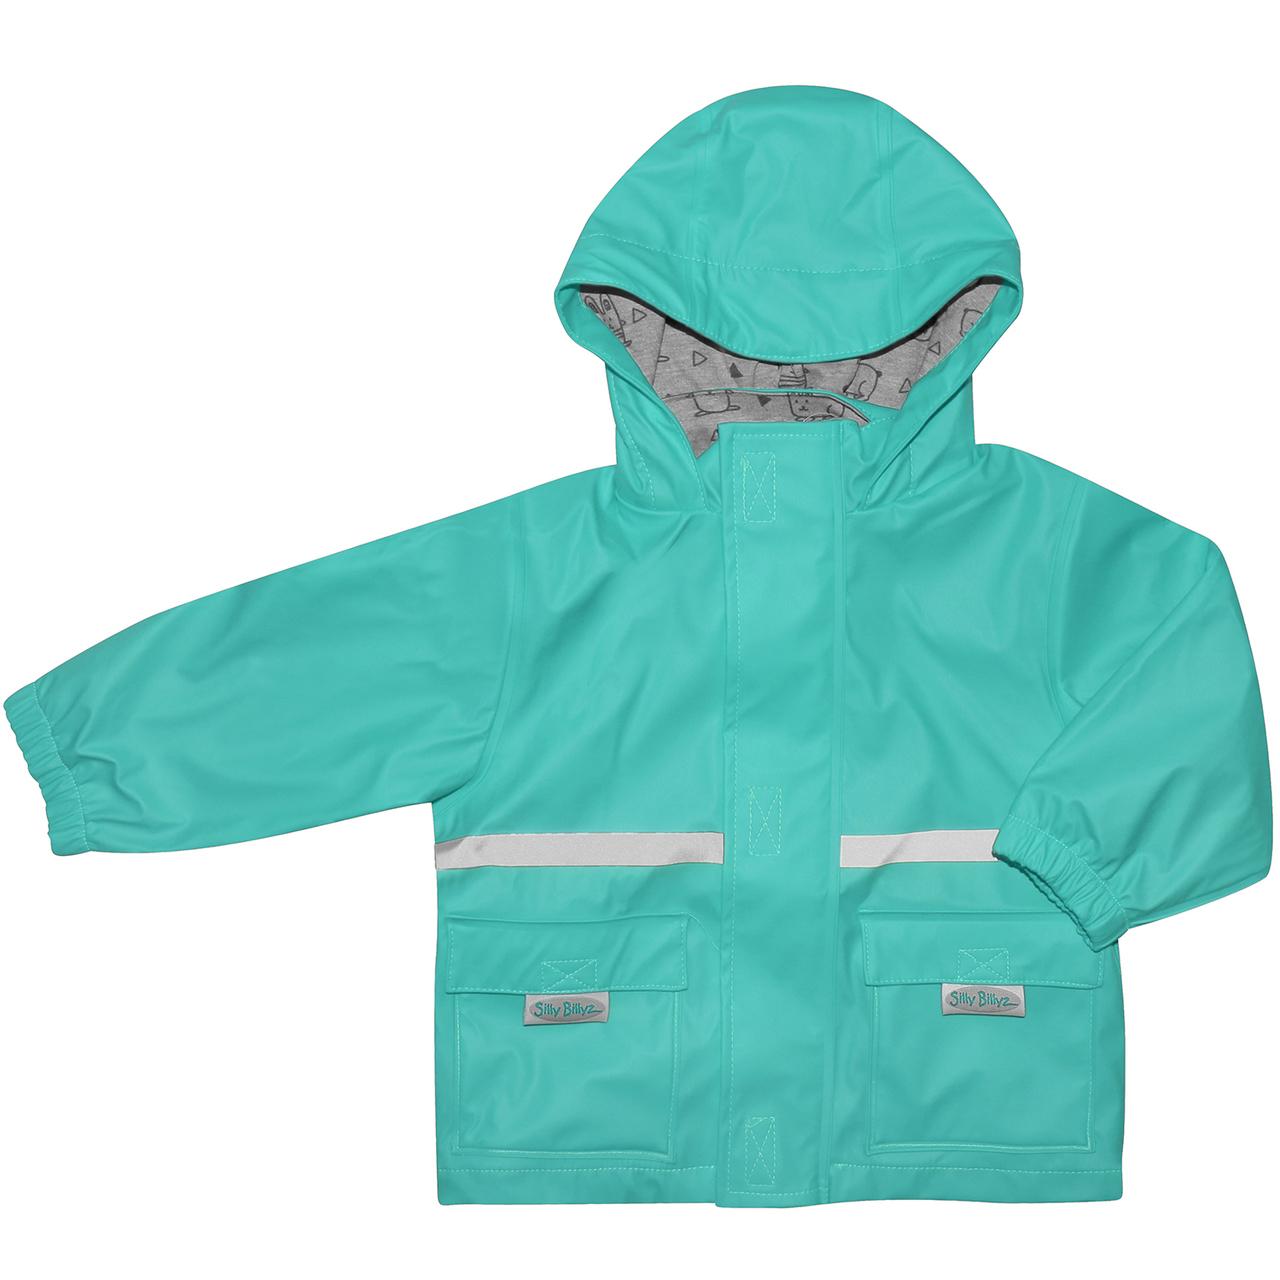 Silly Billyz Waterproof Jacket - Aqua (1-2 Yrs) image